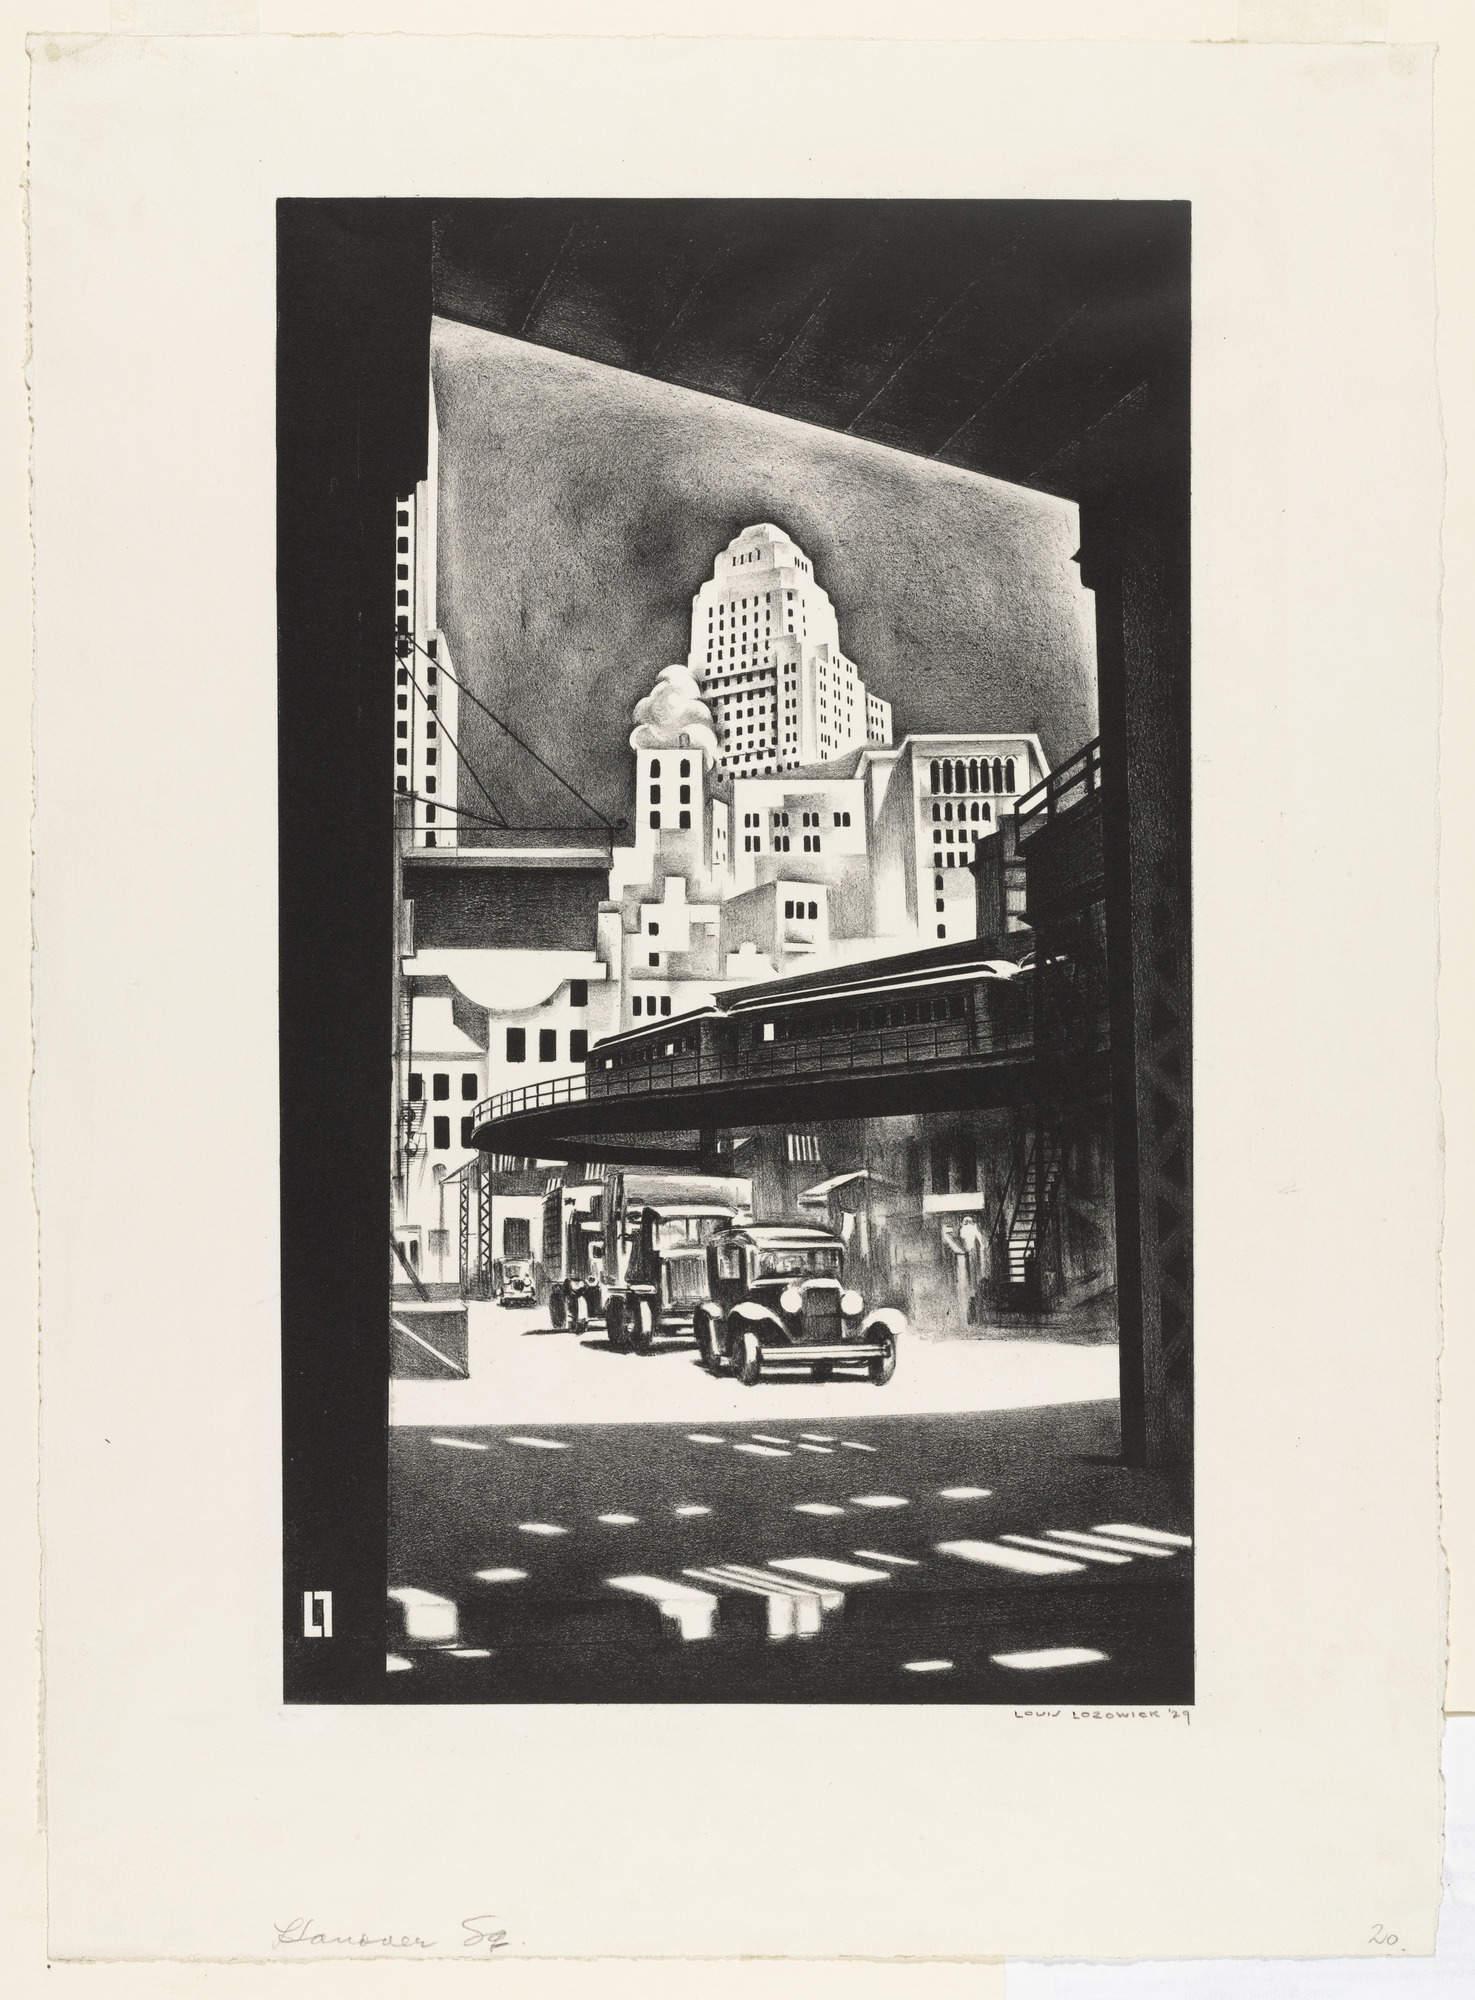 Louis Lozowick Hanover Square 1929